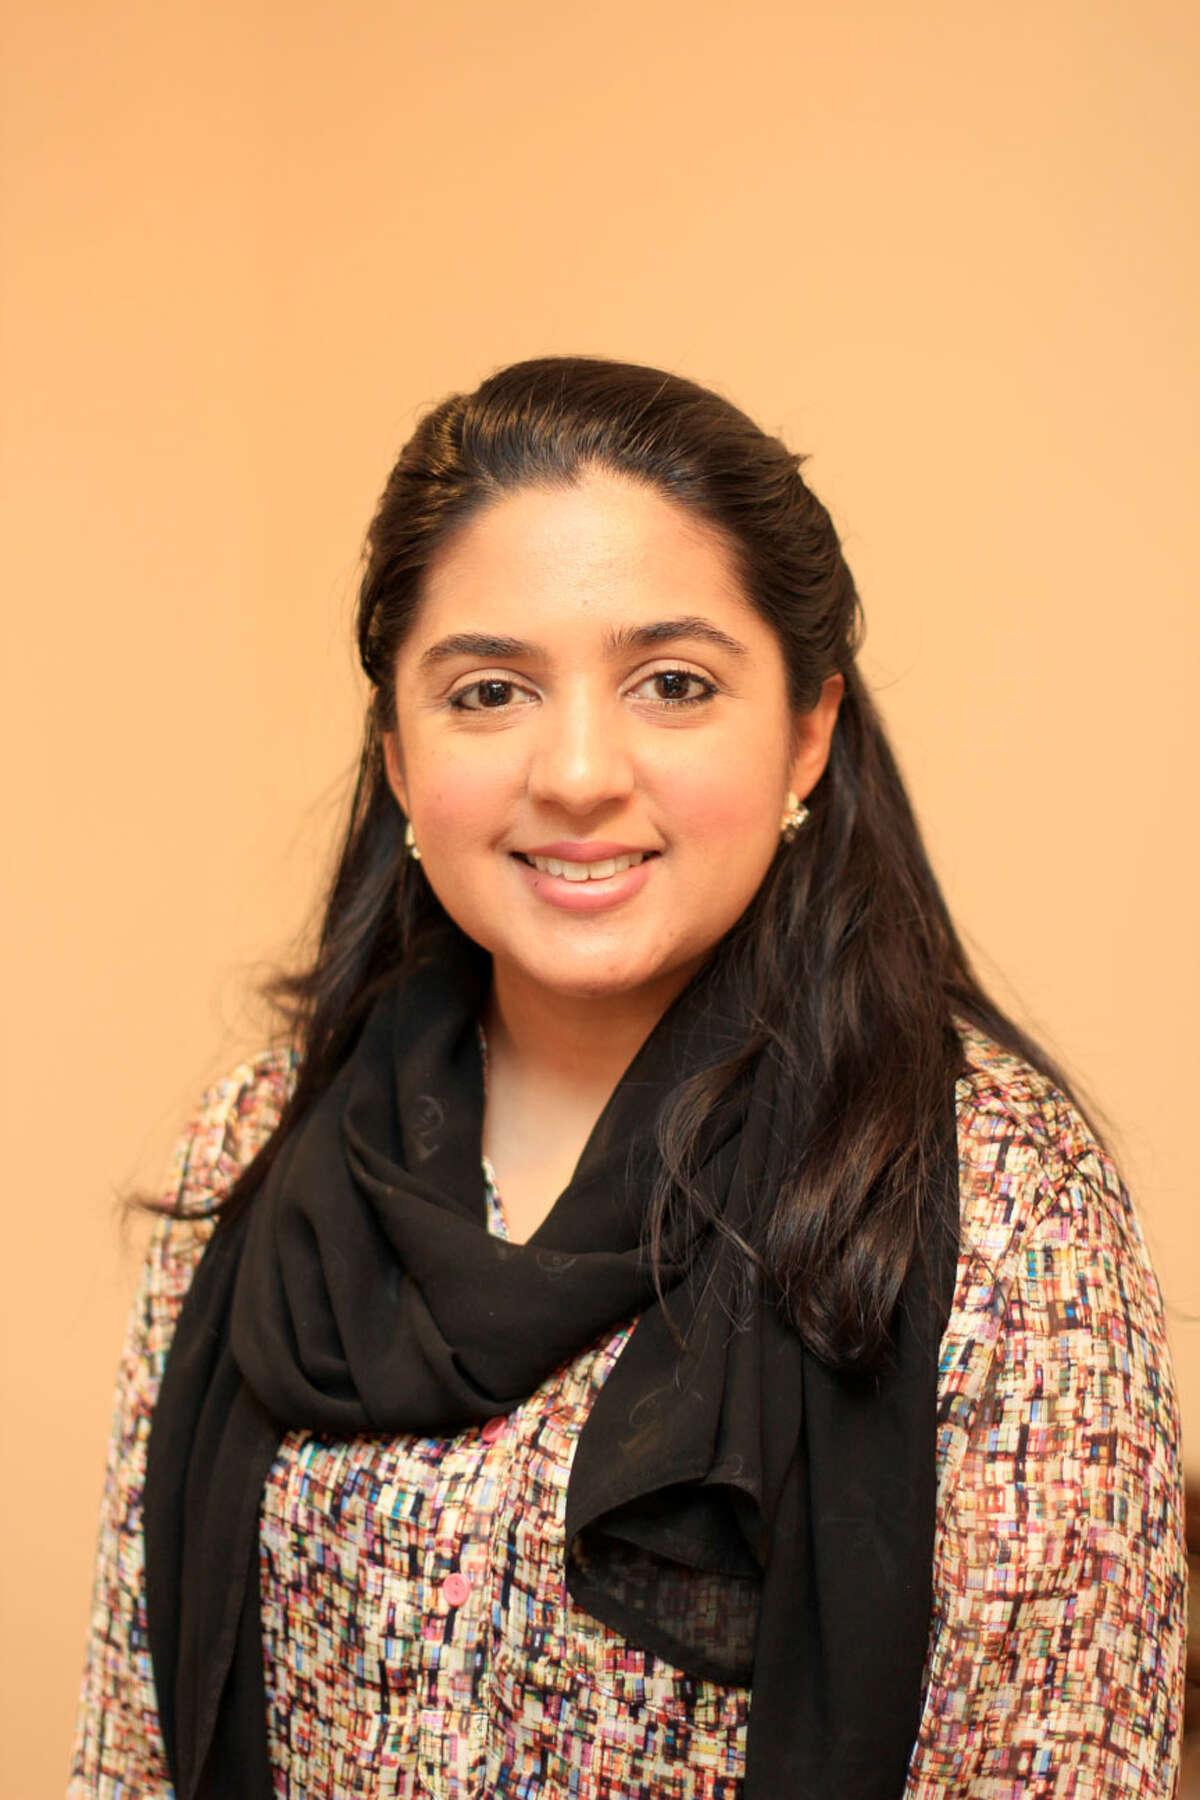 Asma Uddin will speak about feminism in Islam Thursday at the Rothko Chapel.